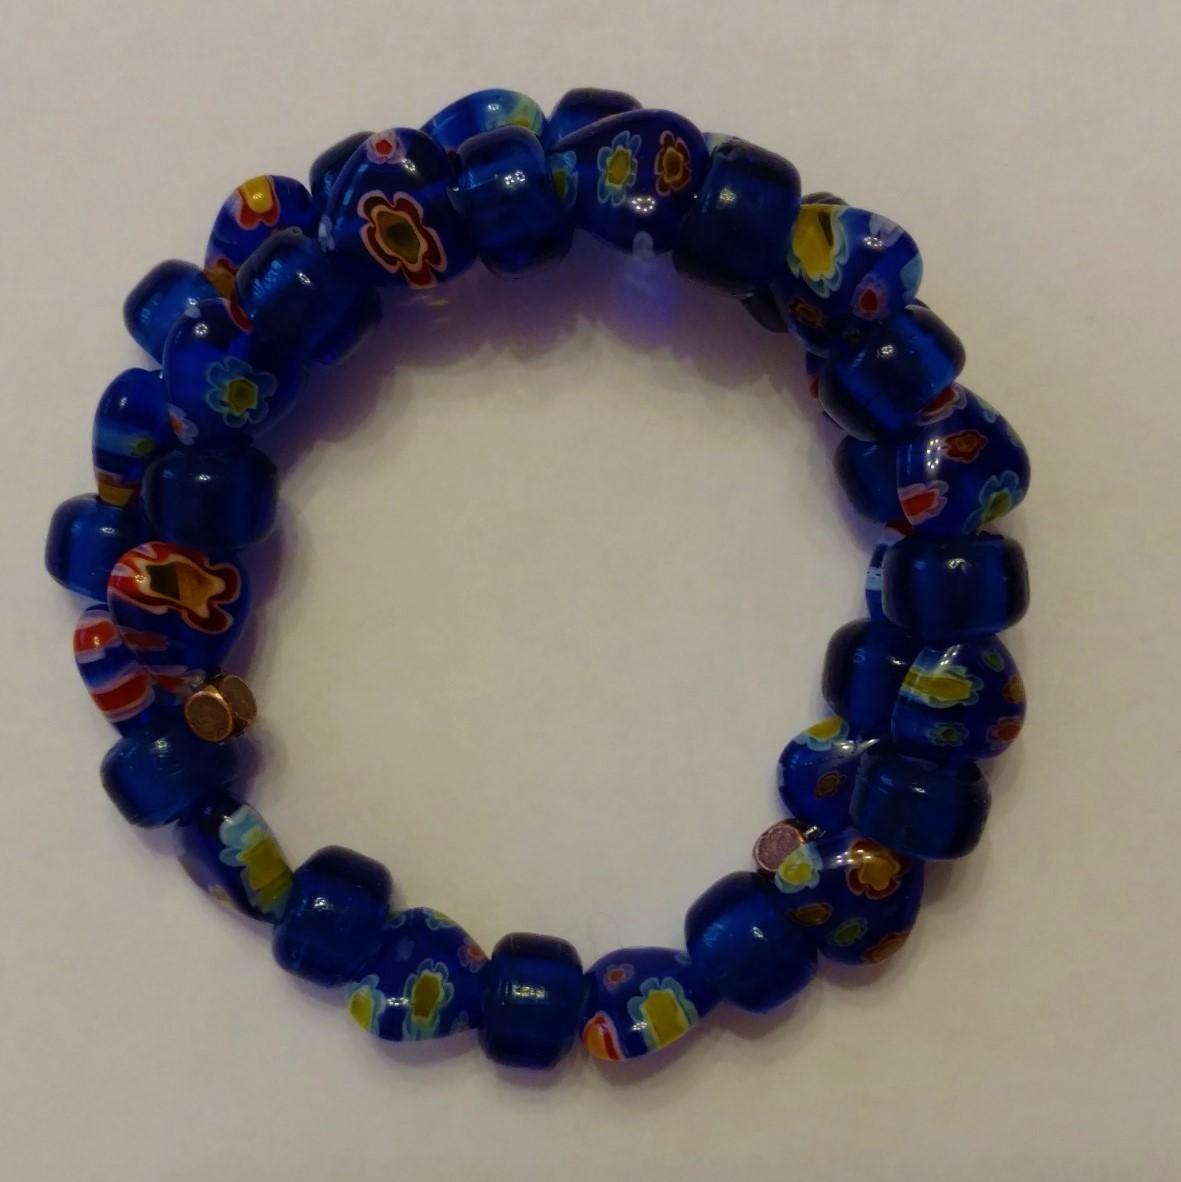 #L&L 181208 Bracelet  Suggested $10 USD